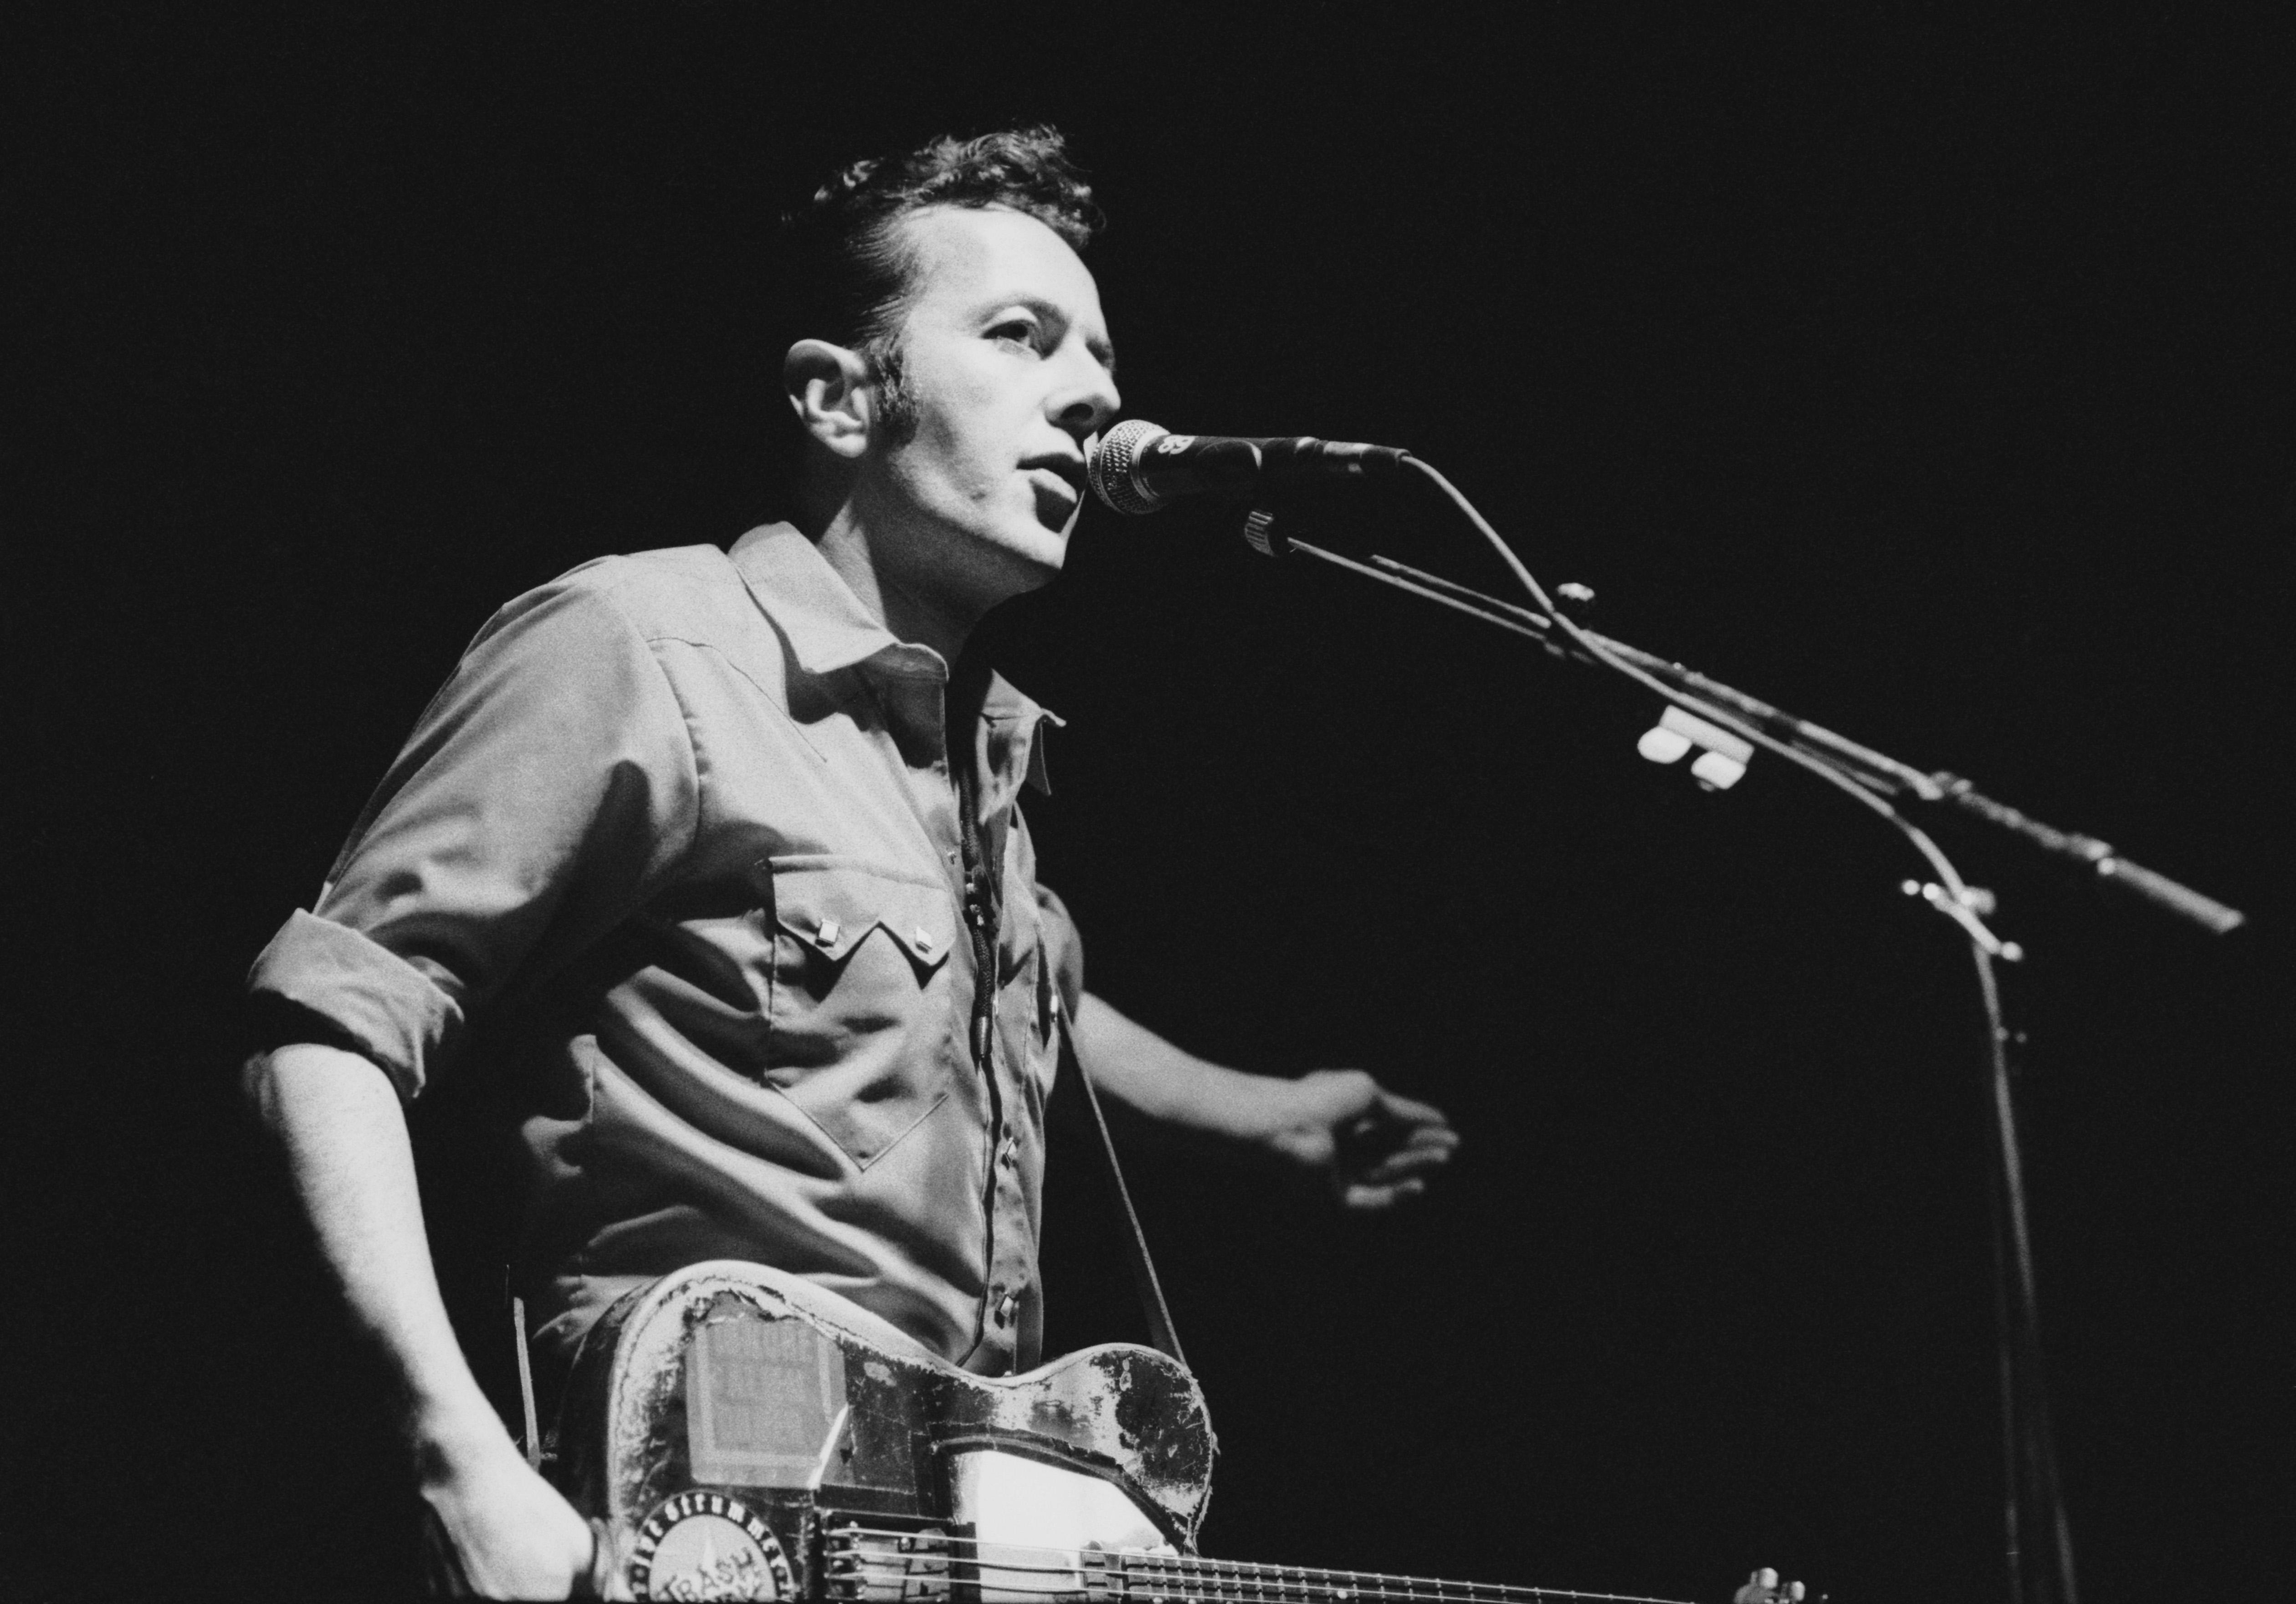 Singer Joe Strummer (1952 ? 2002), formerly of British punk band The Clash, performing with his band Latino Rockabilly War at